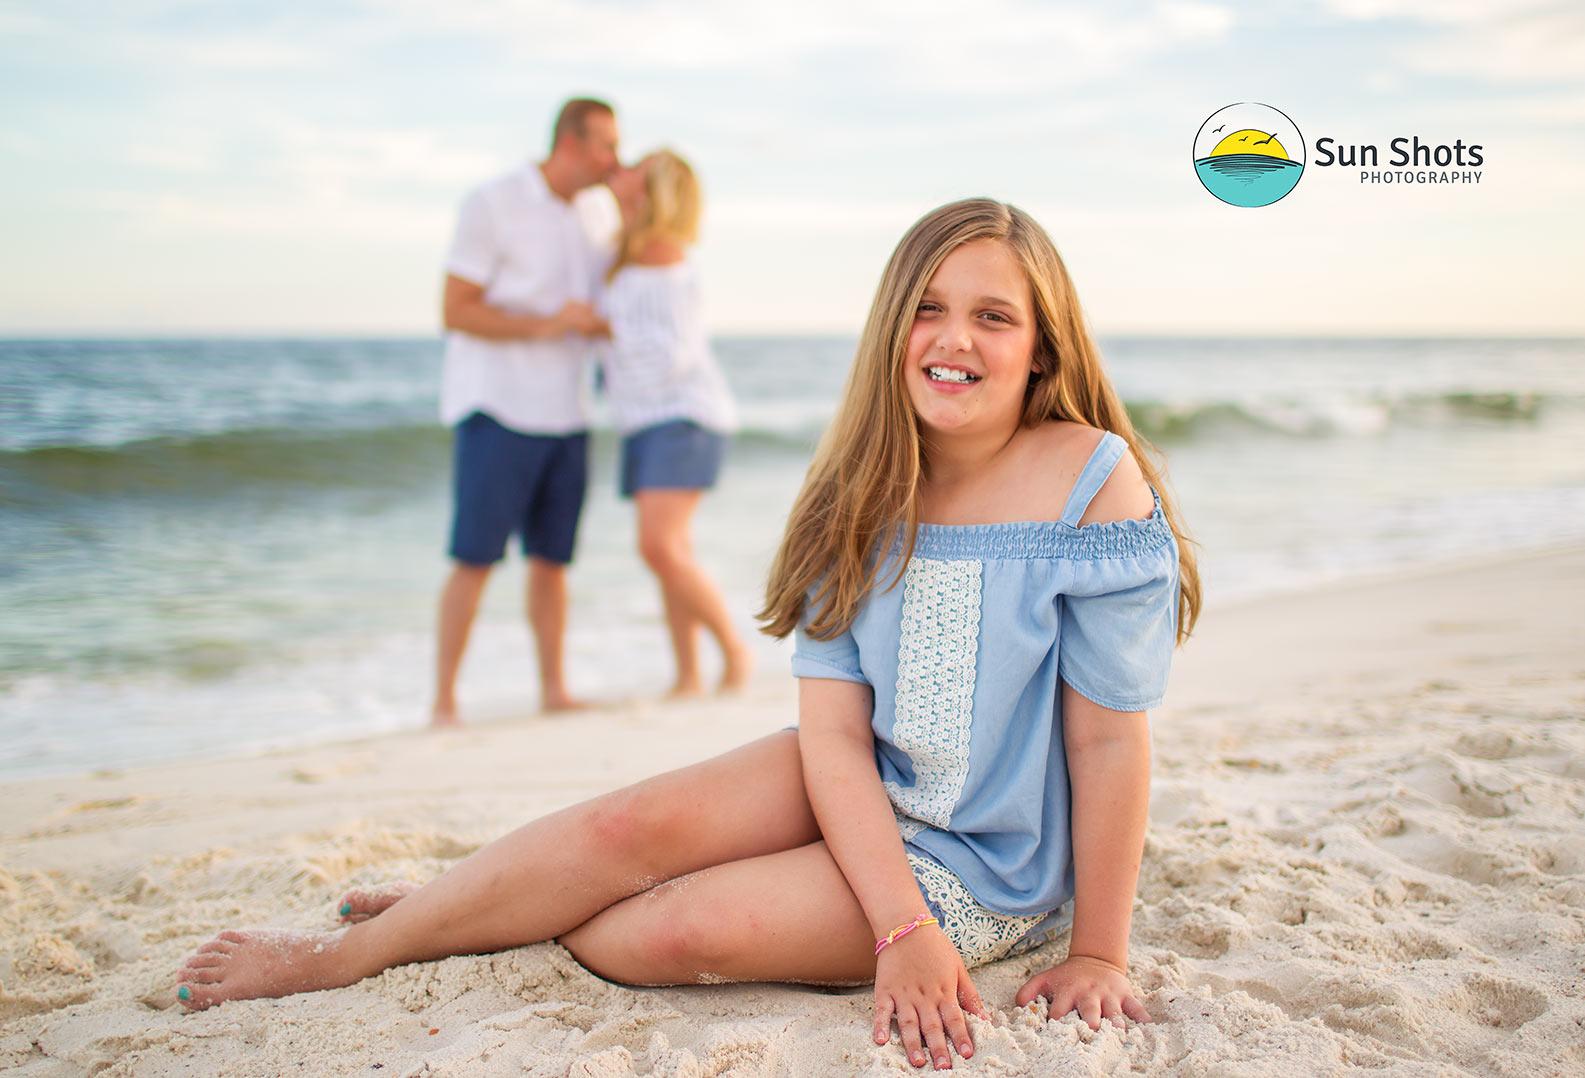 Candid family beach portrait